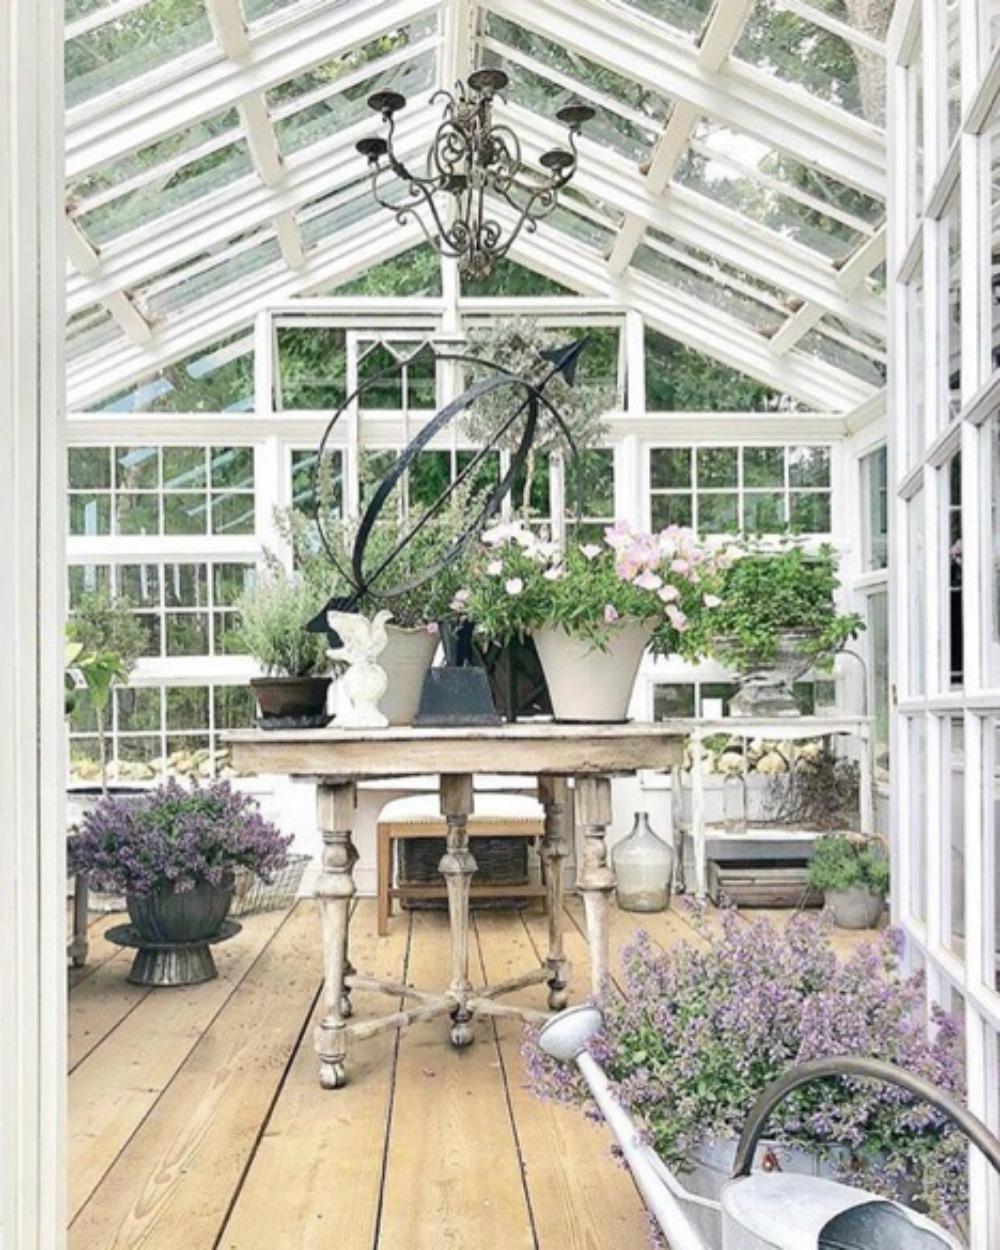 Greenhouse_1000.jpg